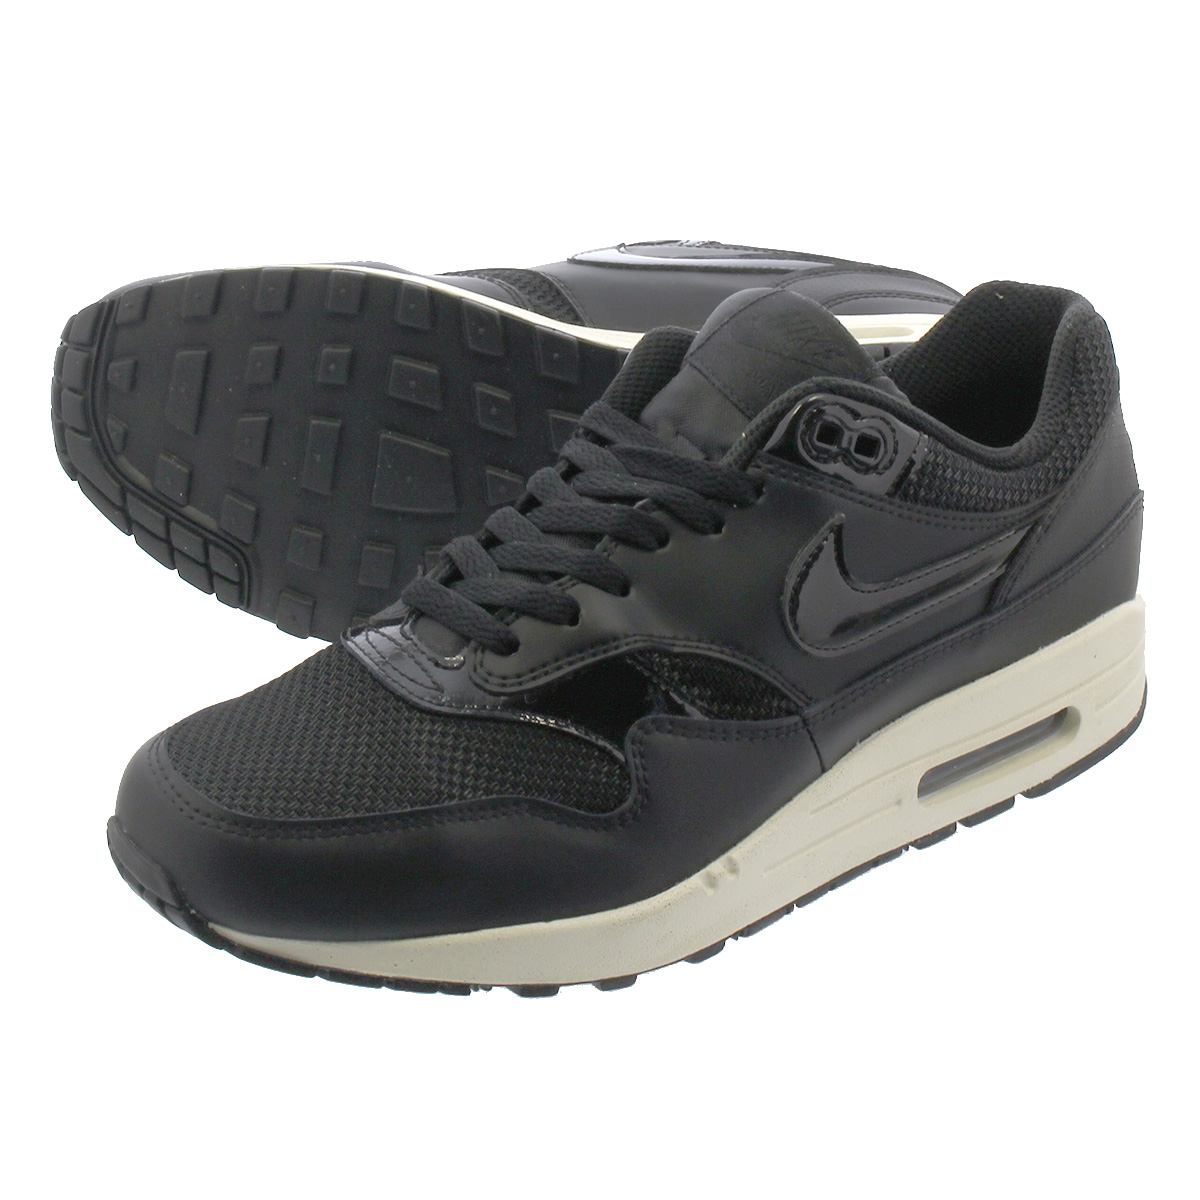 Nike Womens Air Max 1 Black Summit White Trainers 319986 039